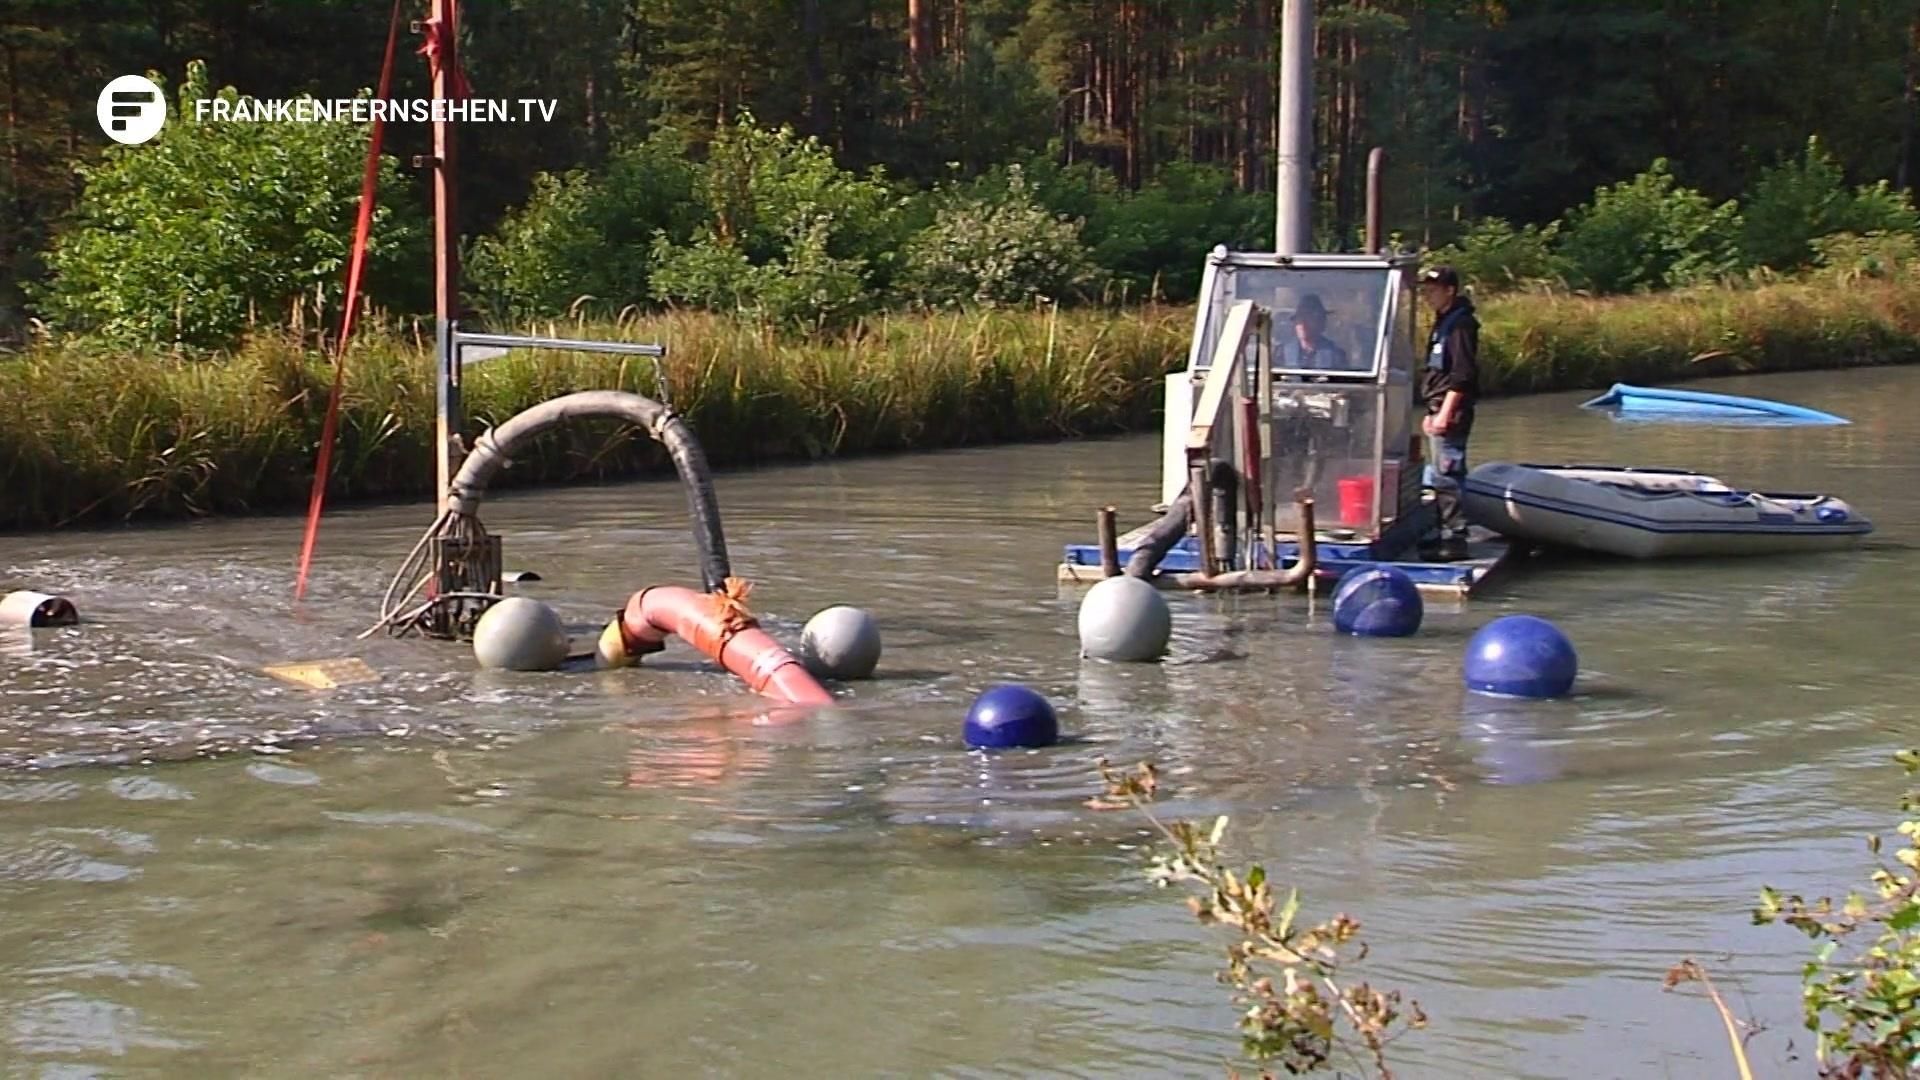 Nessie in Franken – Dieses Monstrum saugt den Alten Kanal sauber ...